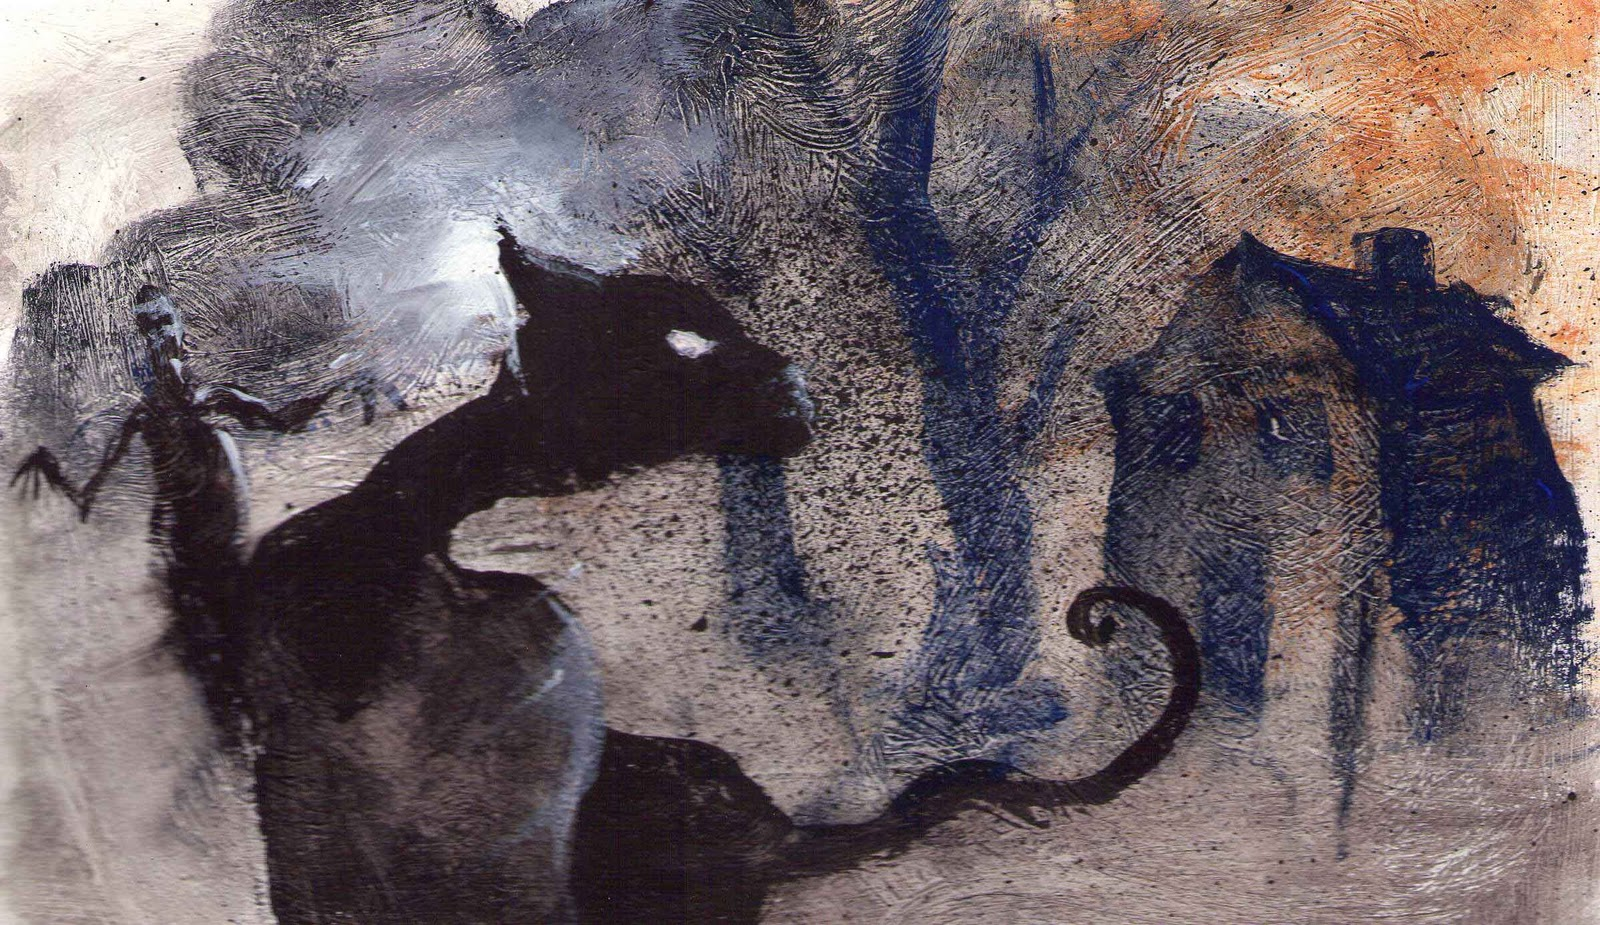 Los gatos de Ulthar (relato)